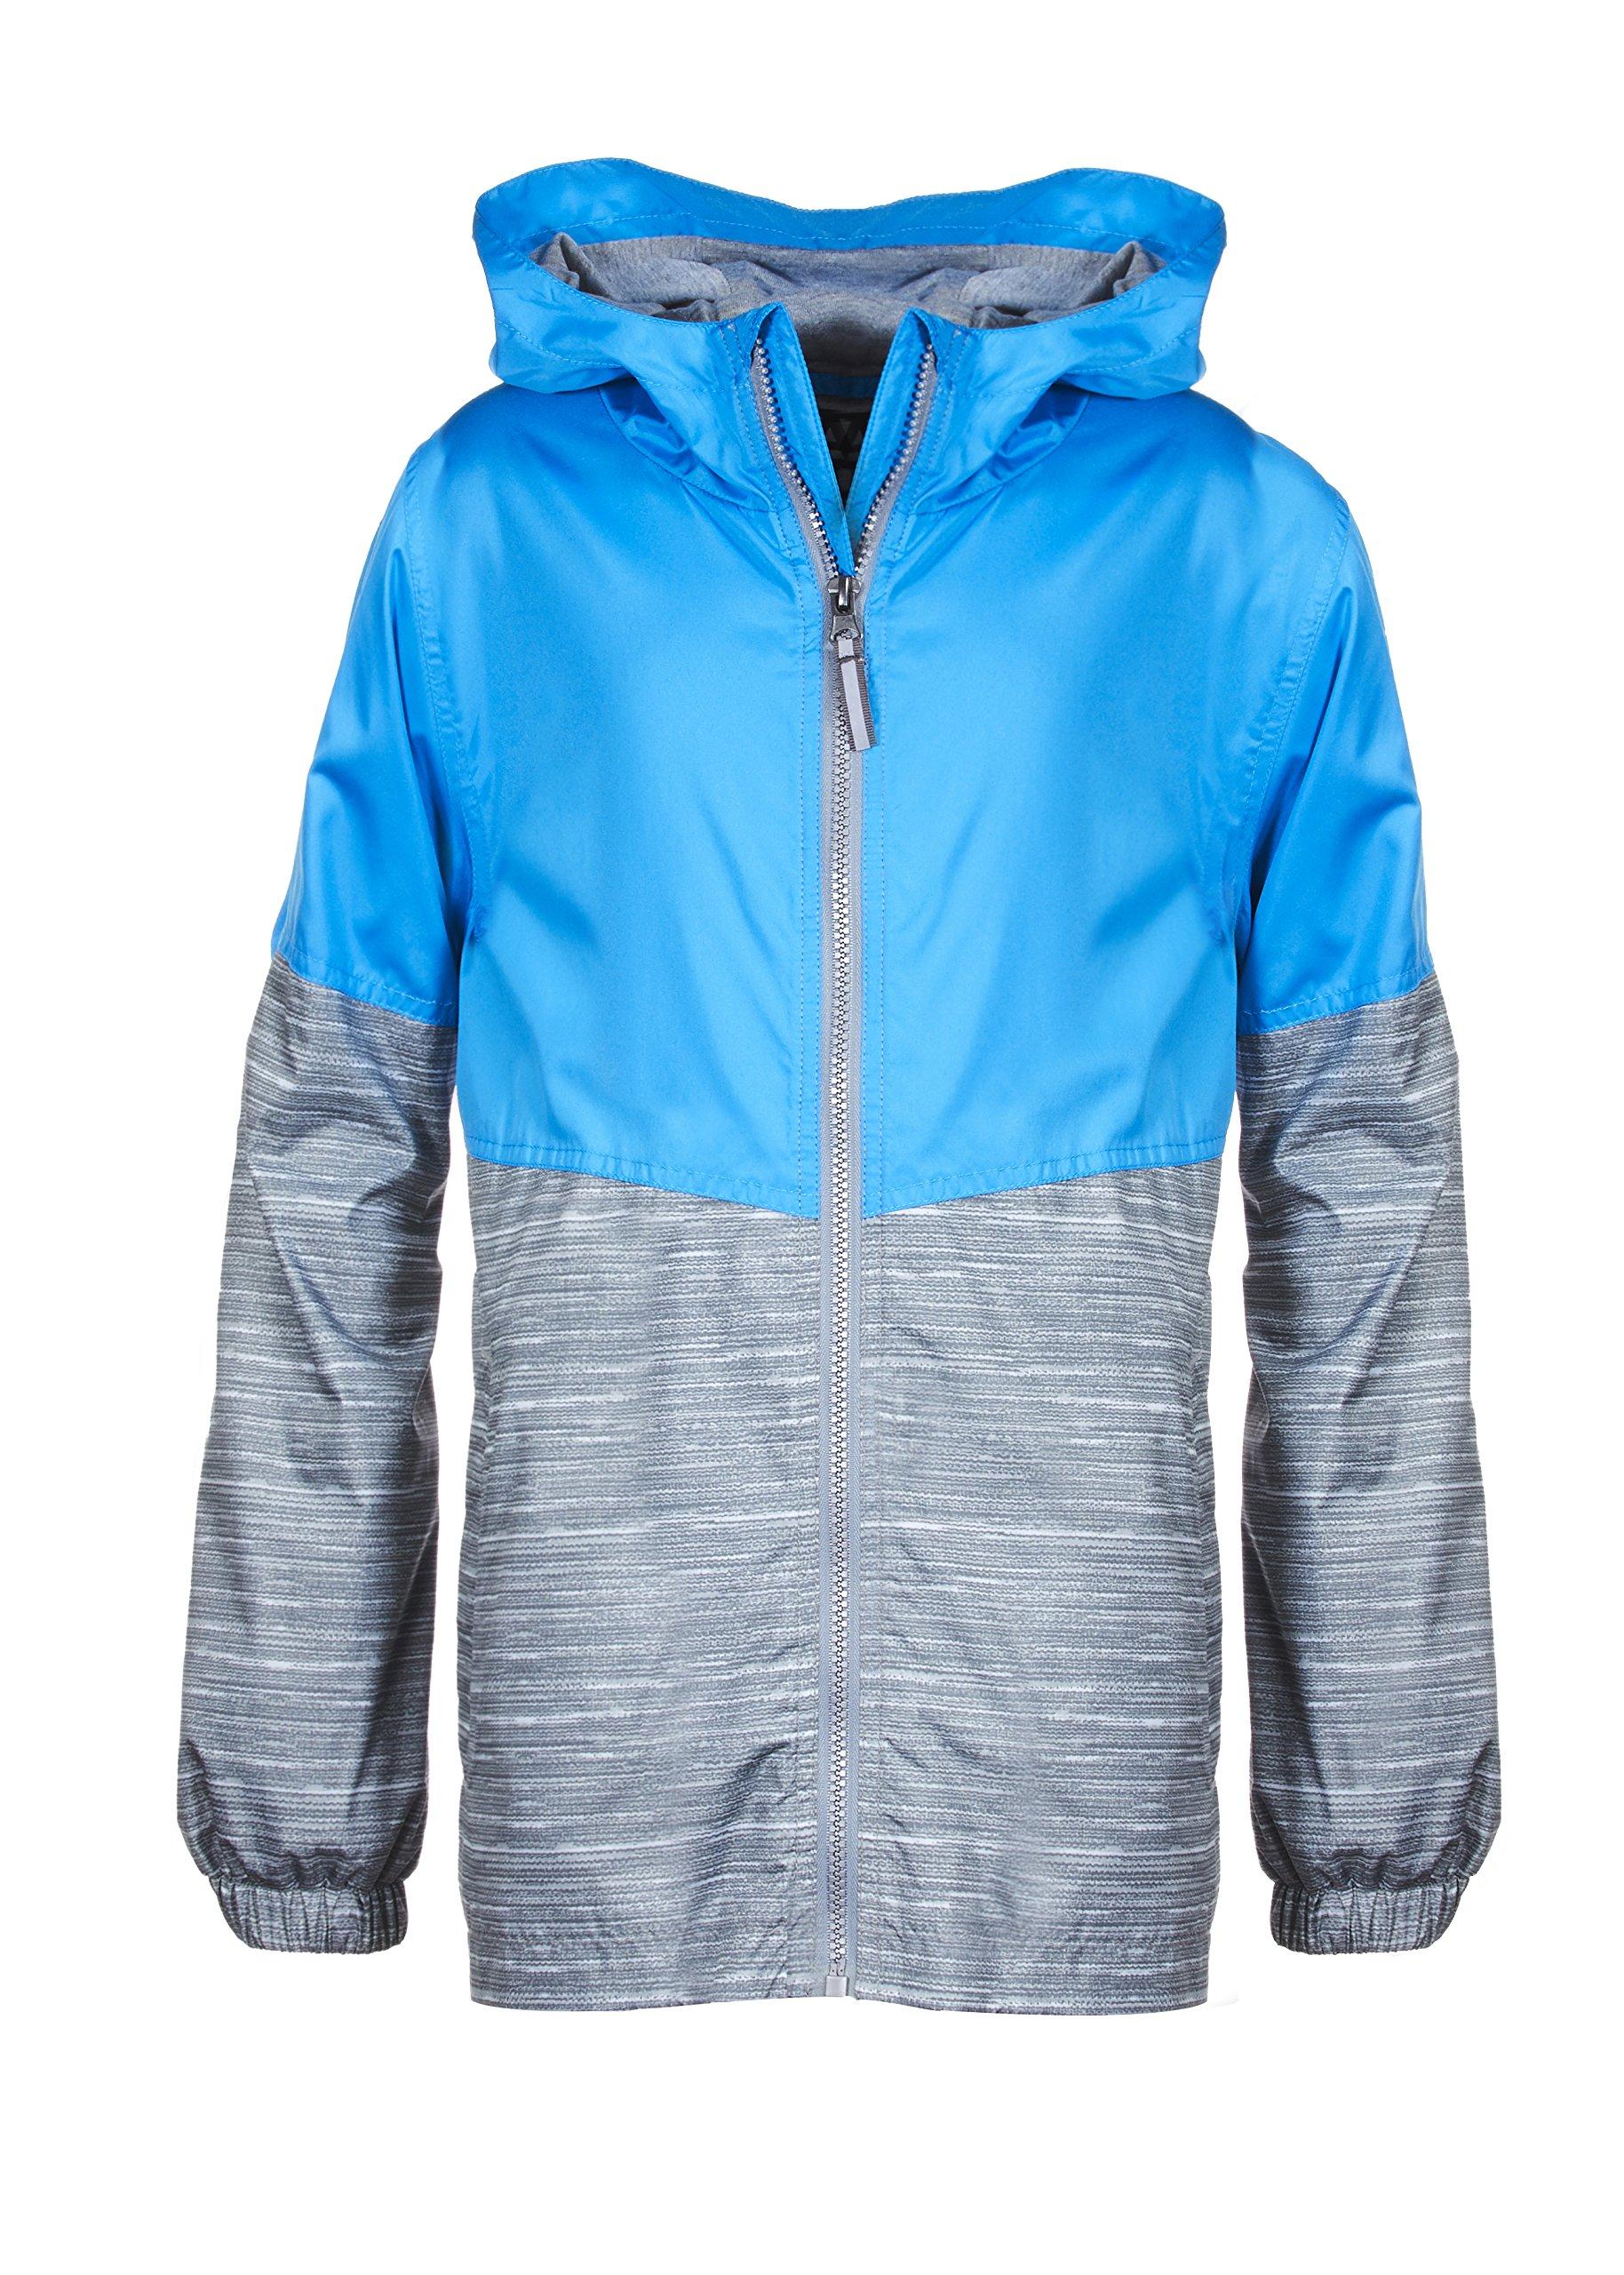 Arctic Quest Children's Colorblock Windbreaker Jacket with Jersey Lining & Hood Turquoise 10/12